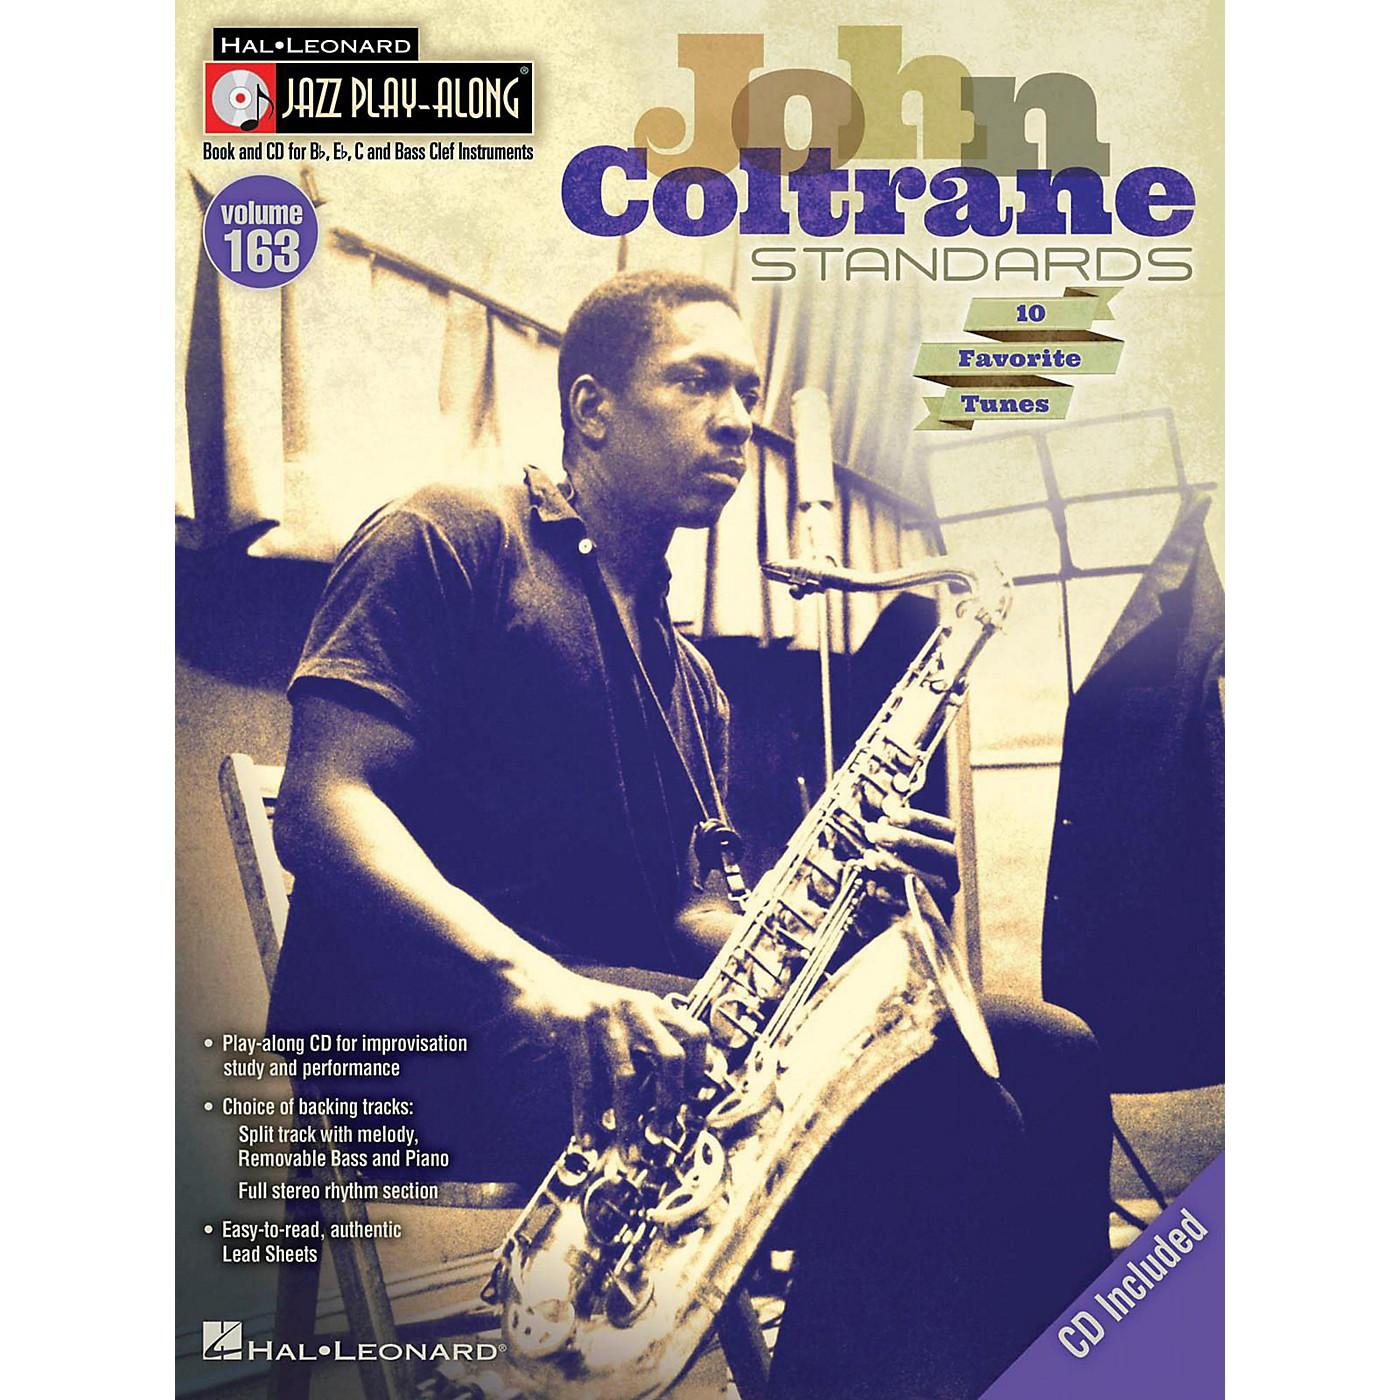 Hal Leonard John Coltrane Standards - Jazz Play-Along Volume 163 Book/CD thumbnail